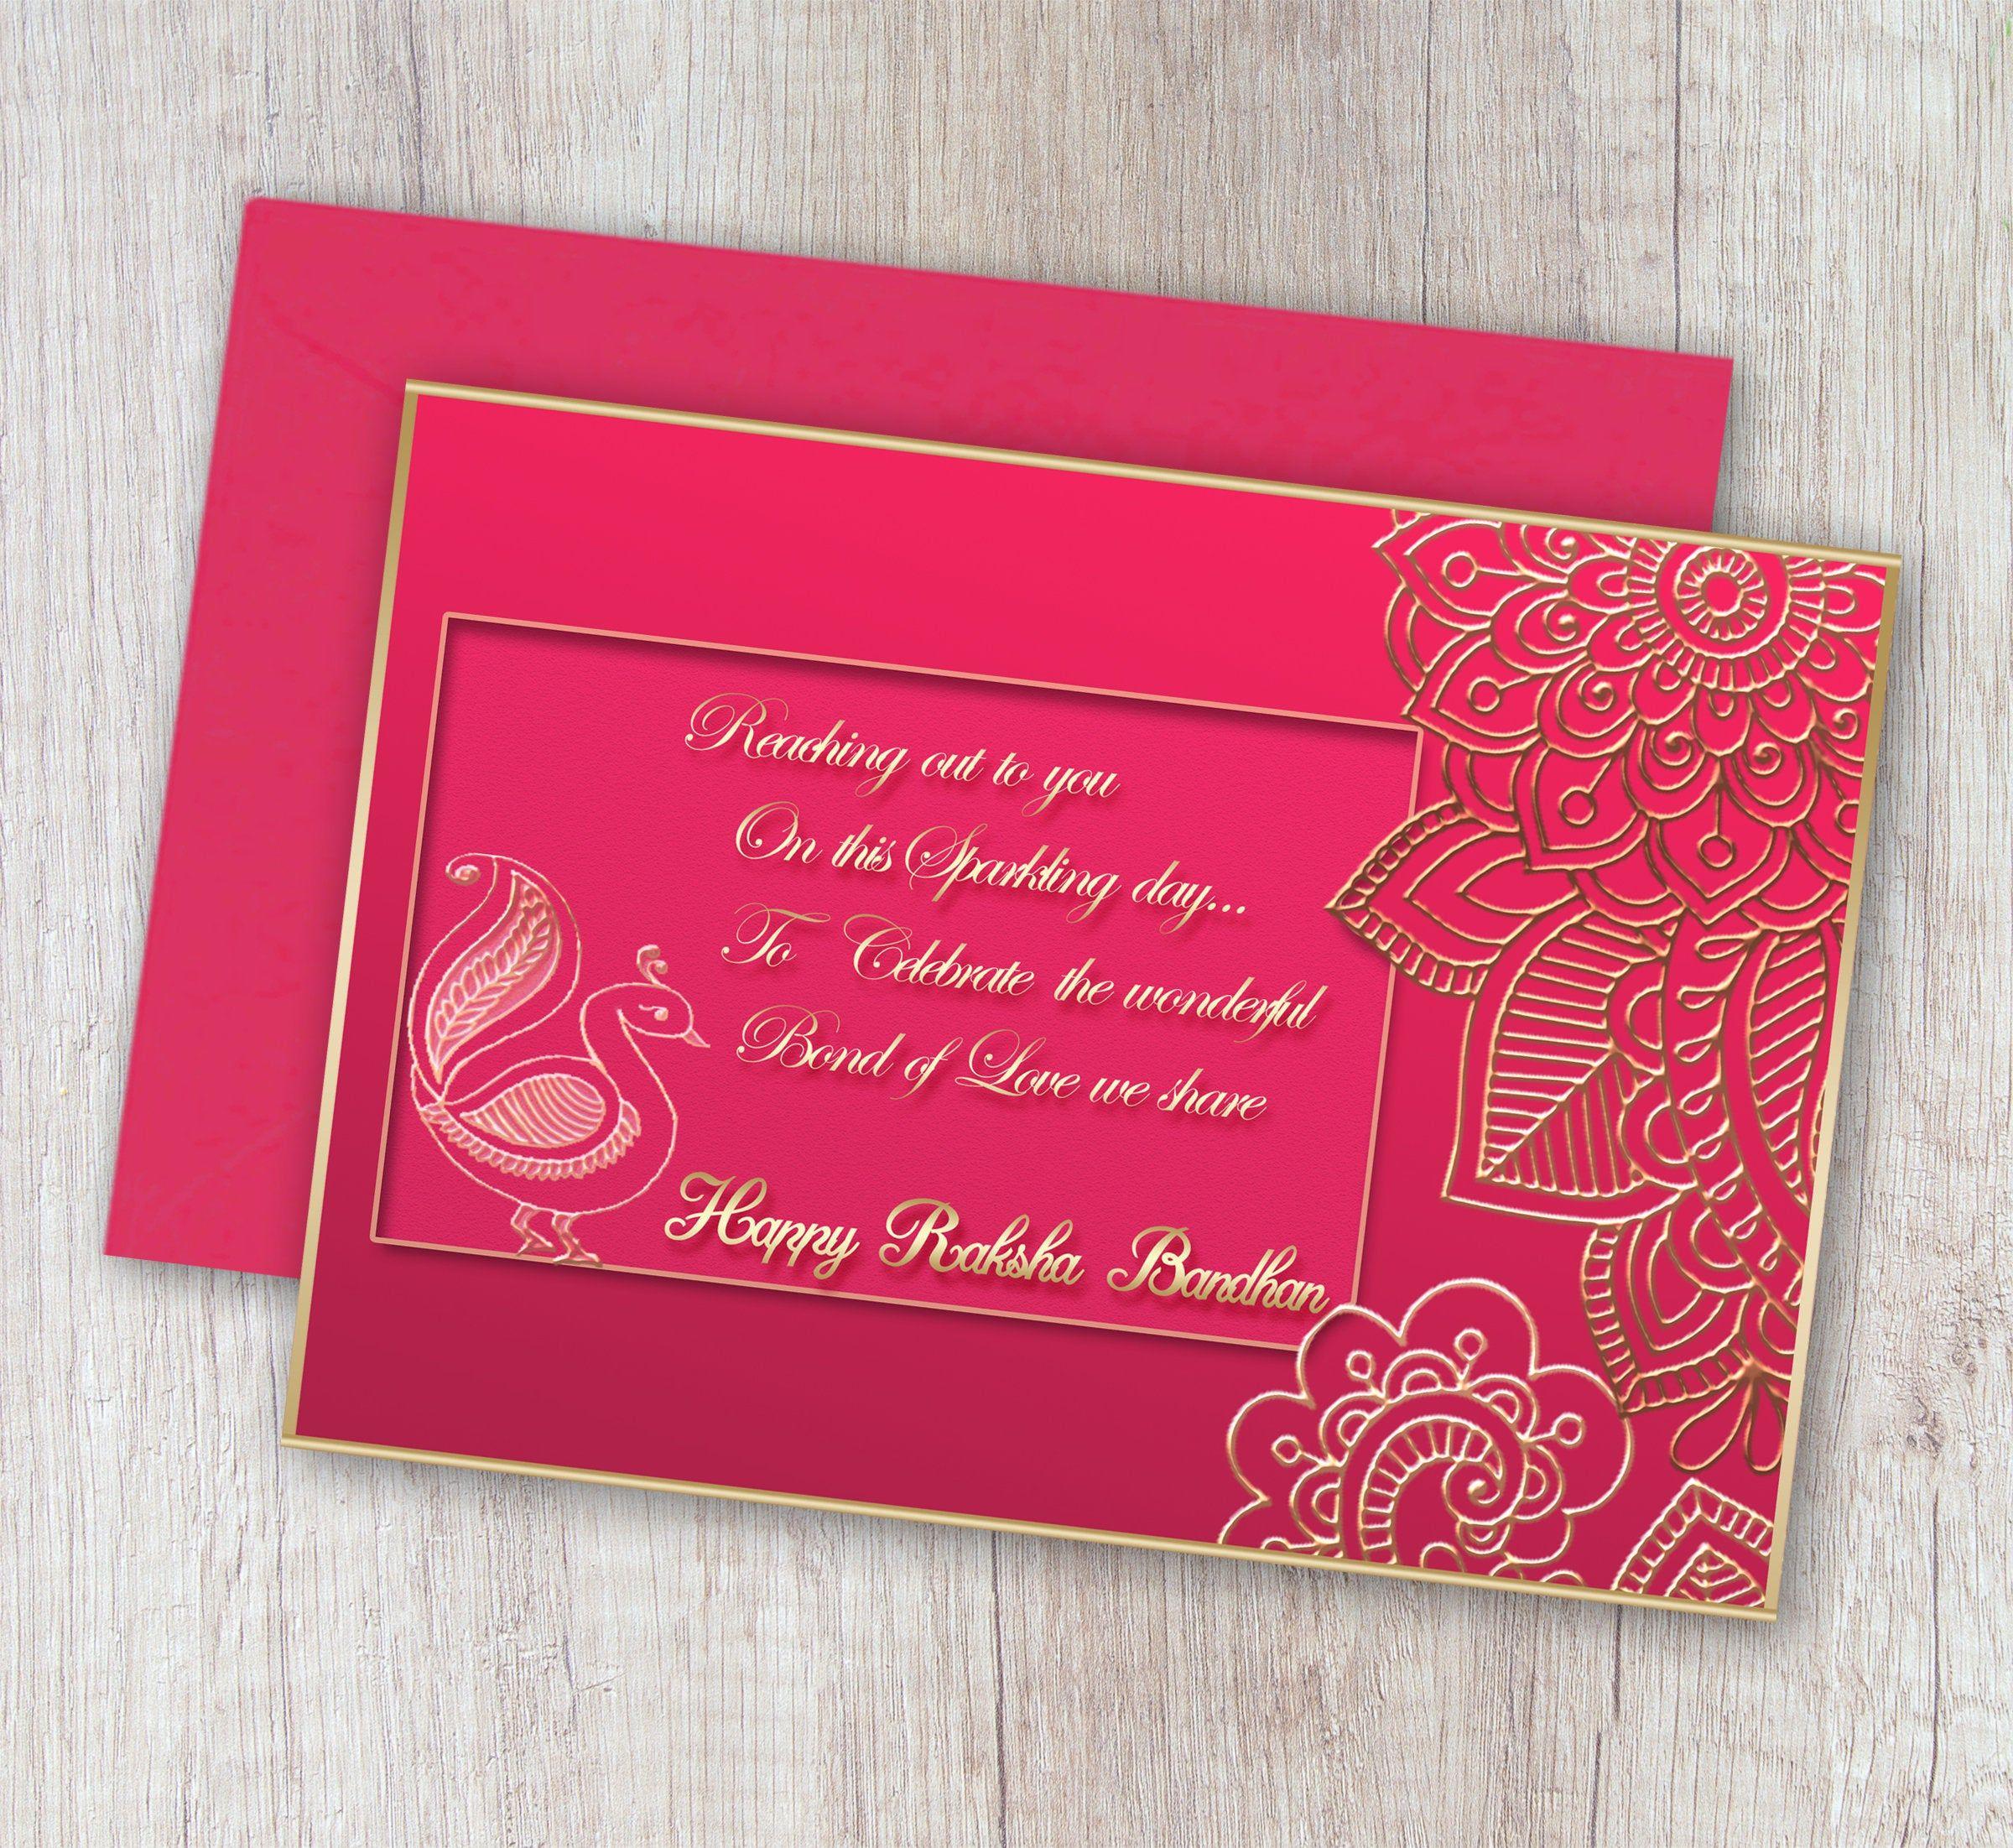 Printable Raksha Bandhan Card Happy Raksha Bandhjan Wish Traditional Golden Motifs Card For Brother For Sister Instant Download In 2021 Raksha Bandhan Cards Raksha Bandhan Happy Rakshabandhan